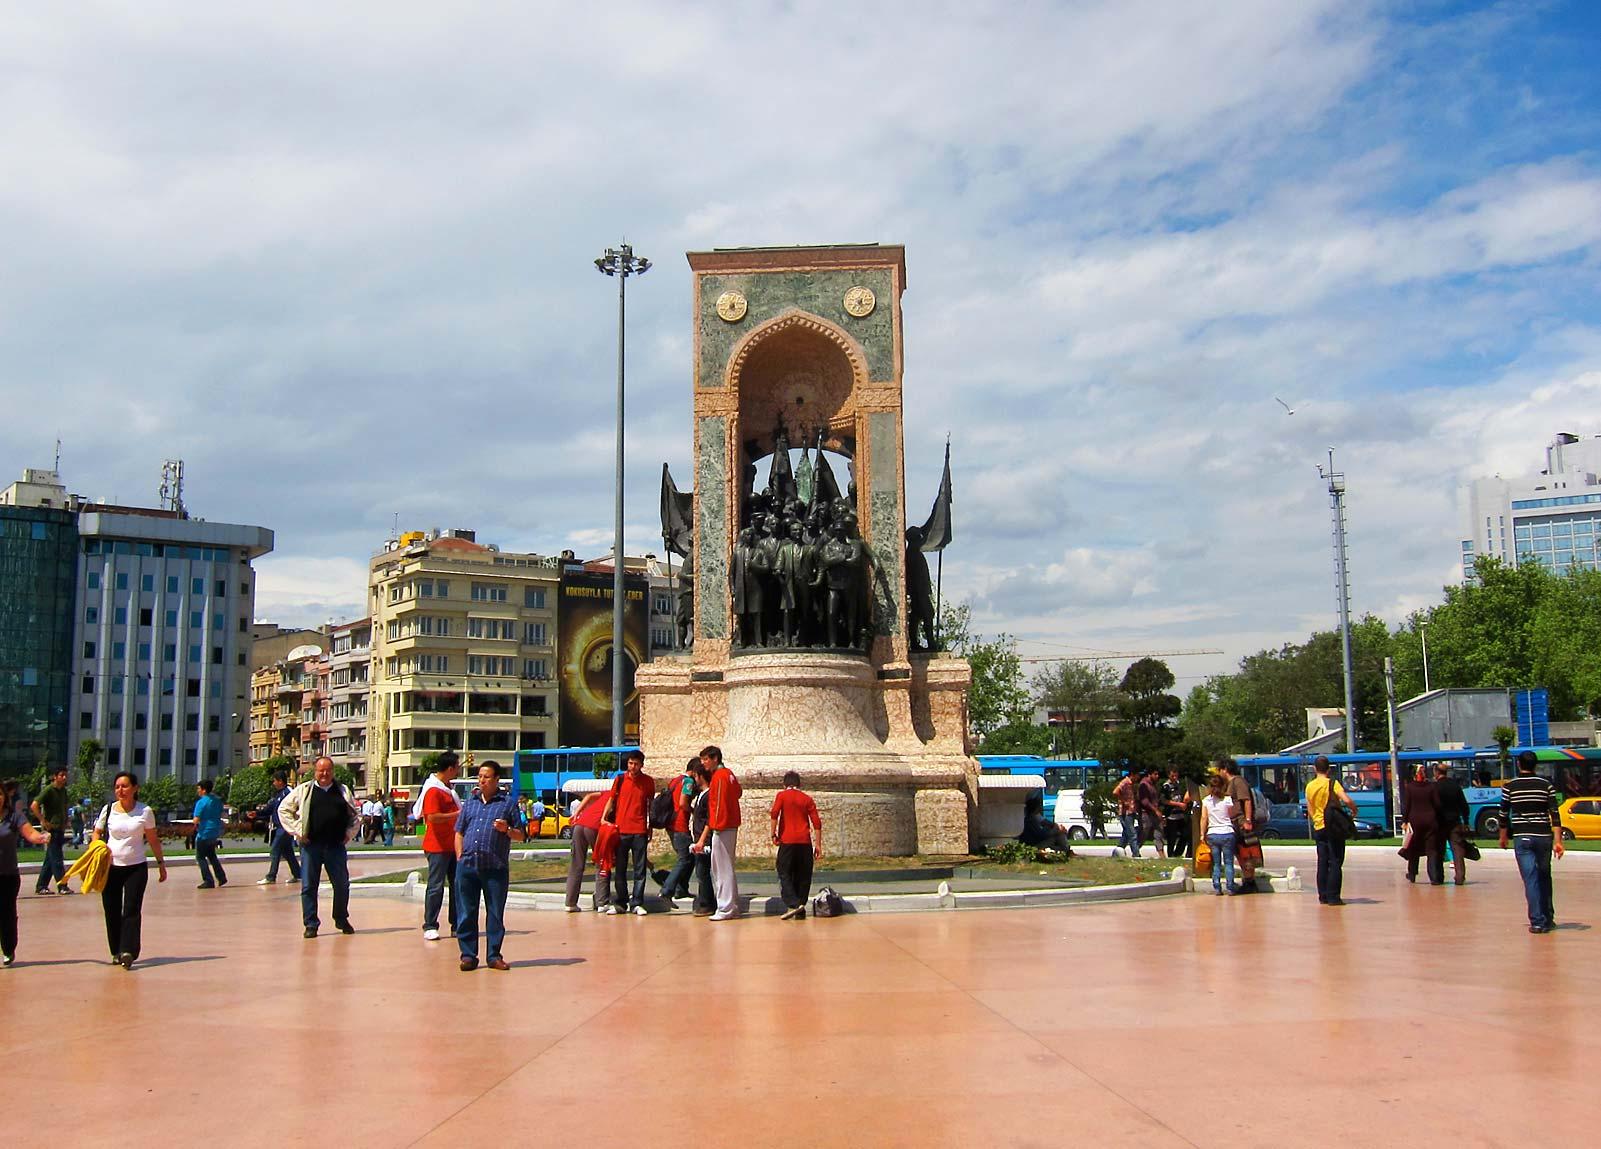 Taksim Square - Hotels Near Taksim Square